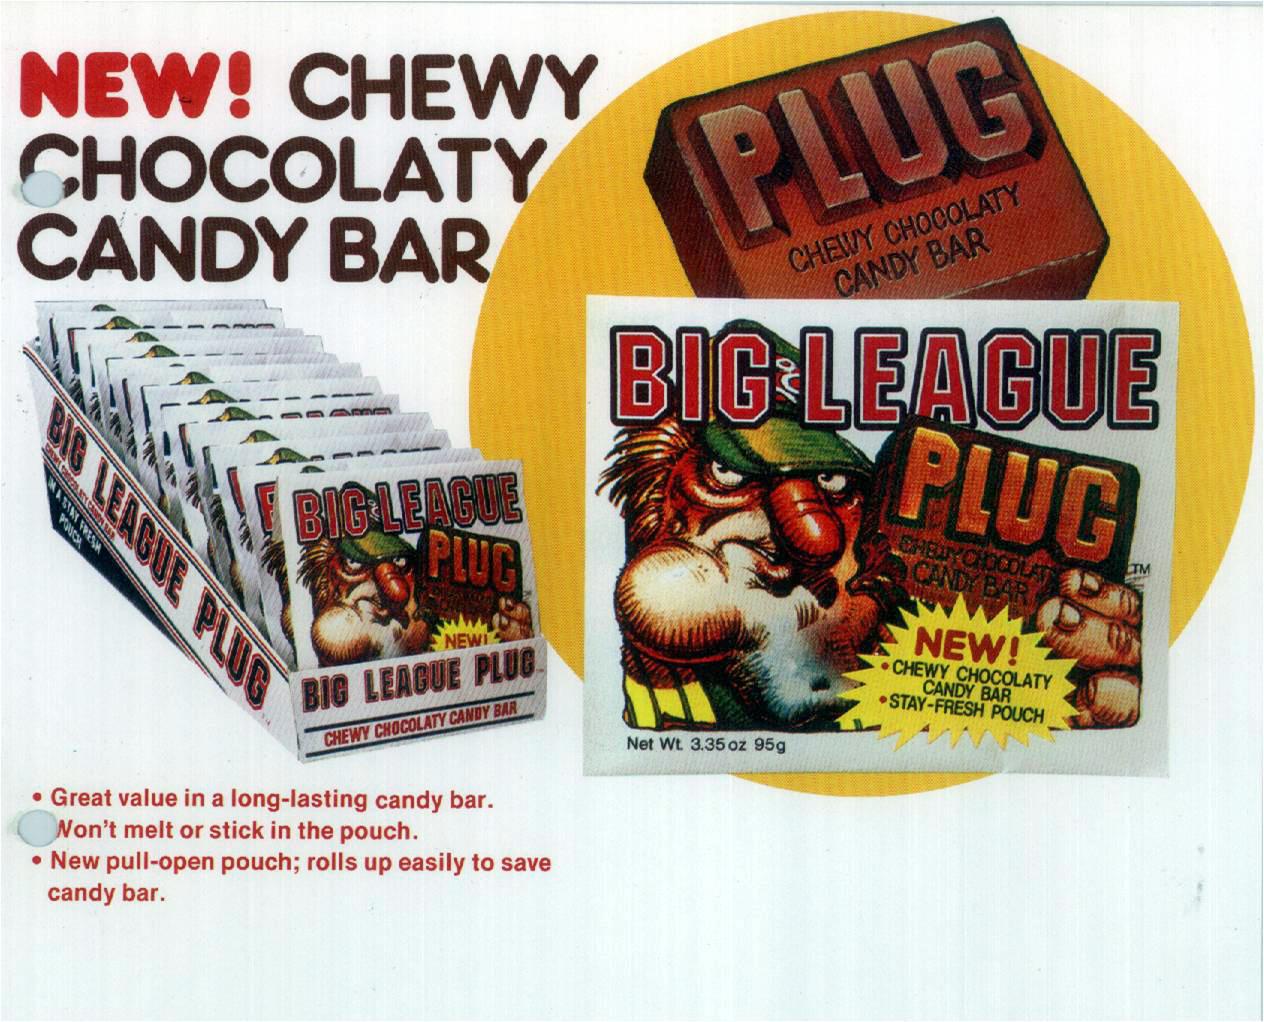 Big League Plug sales sheet.